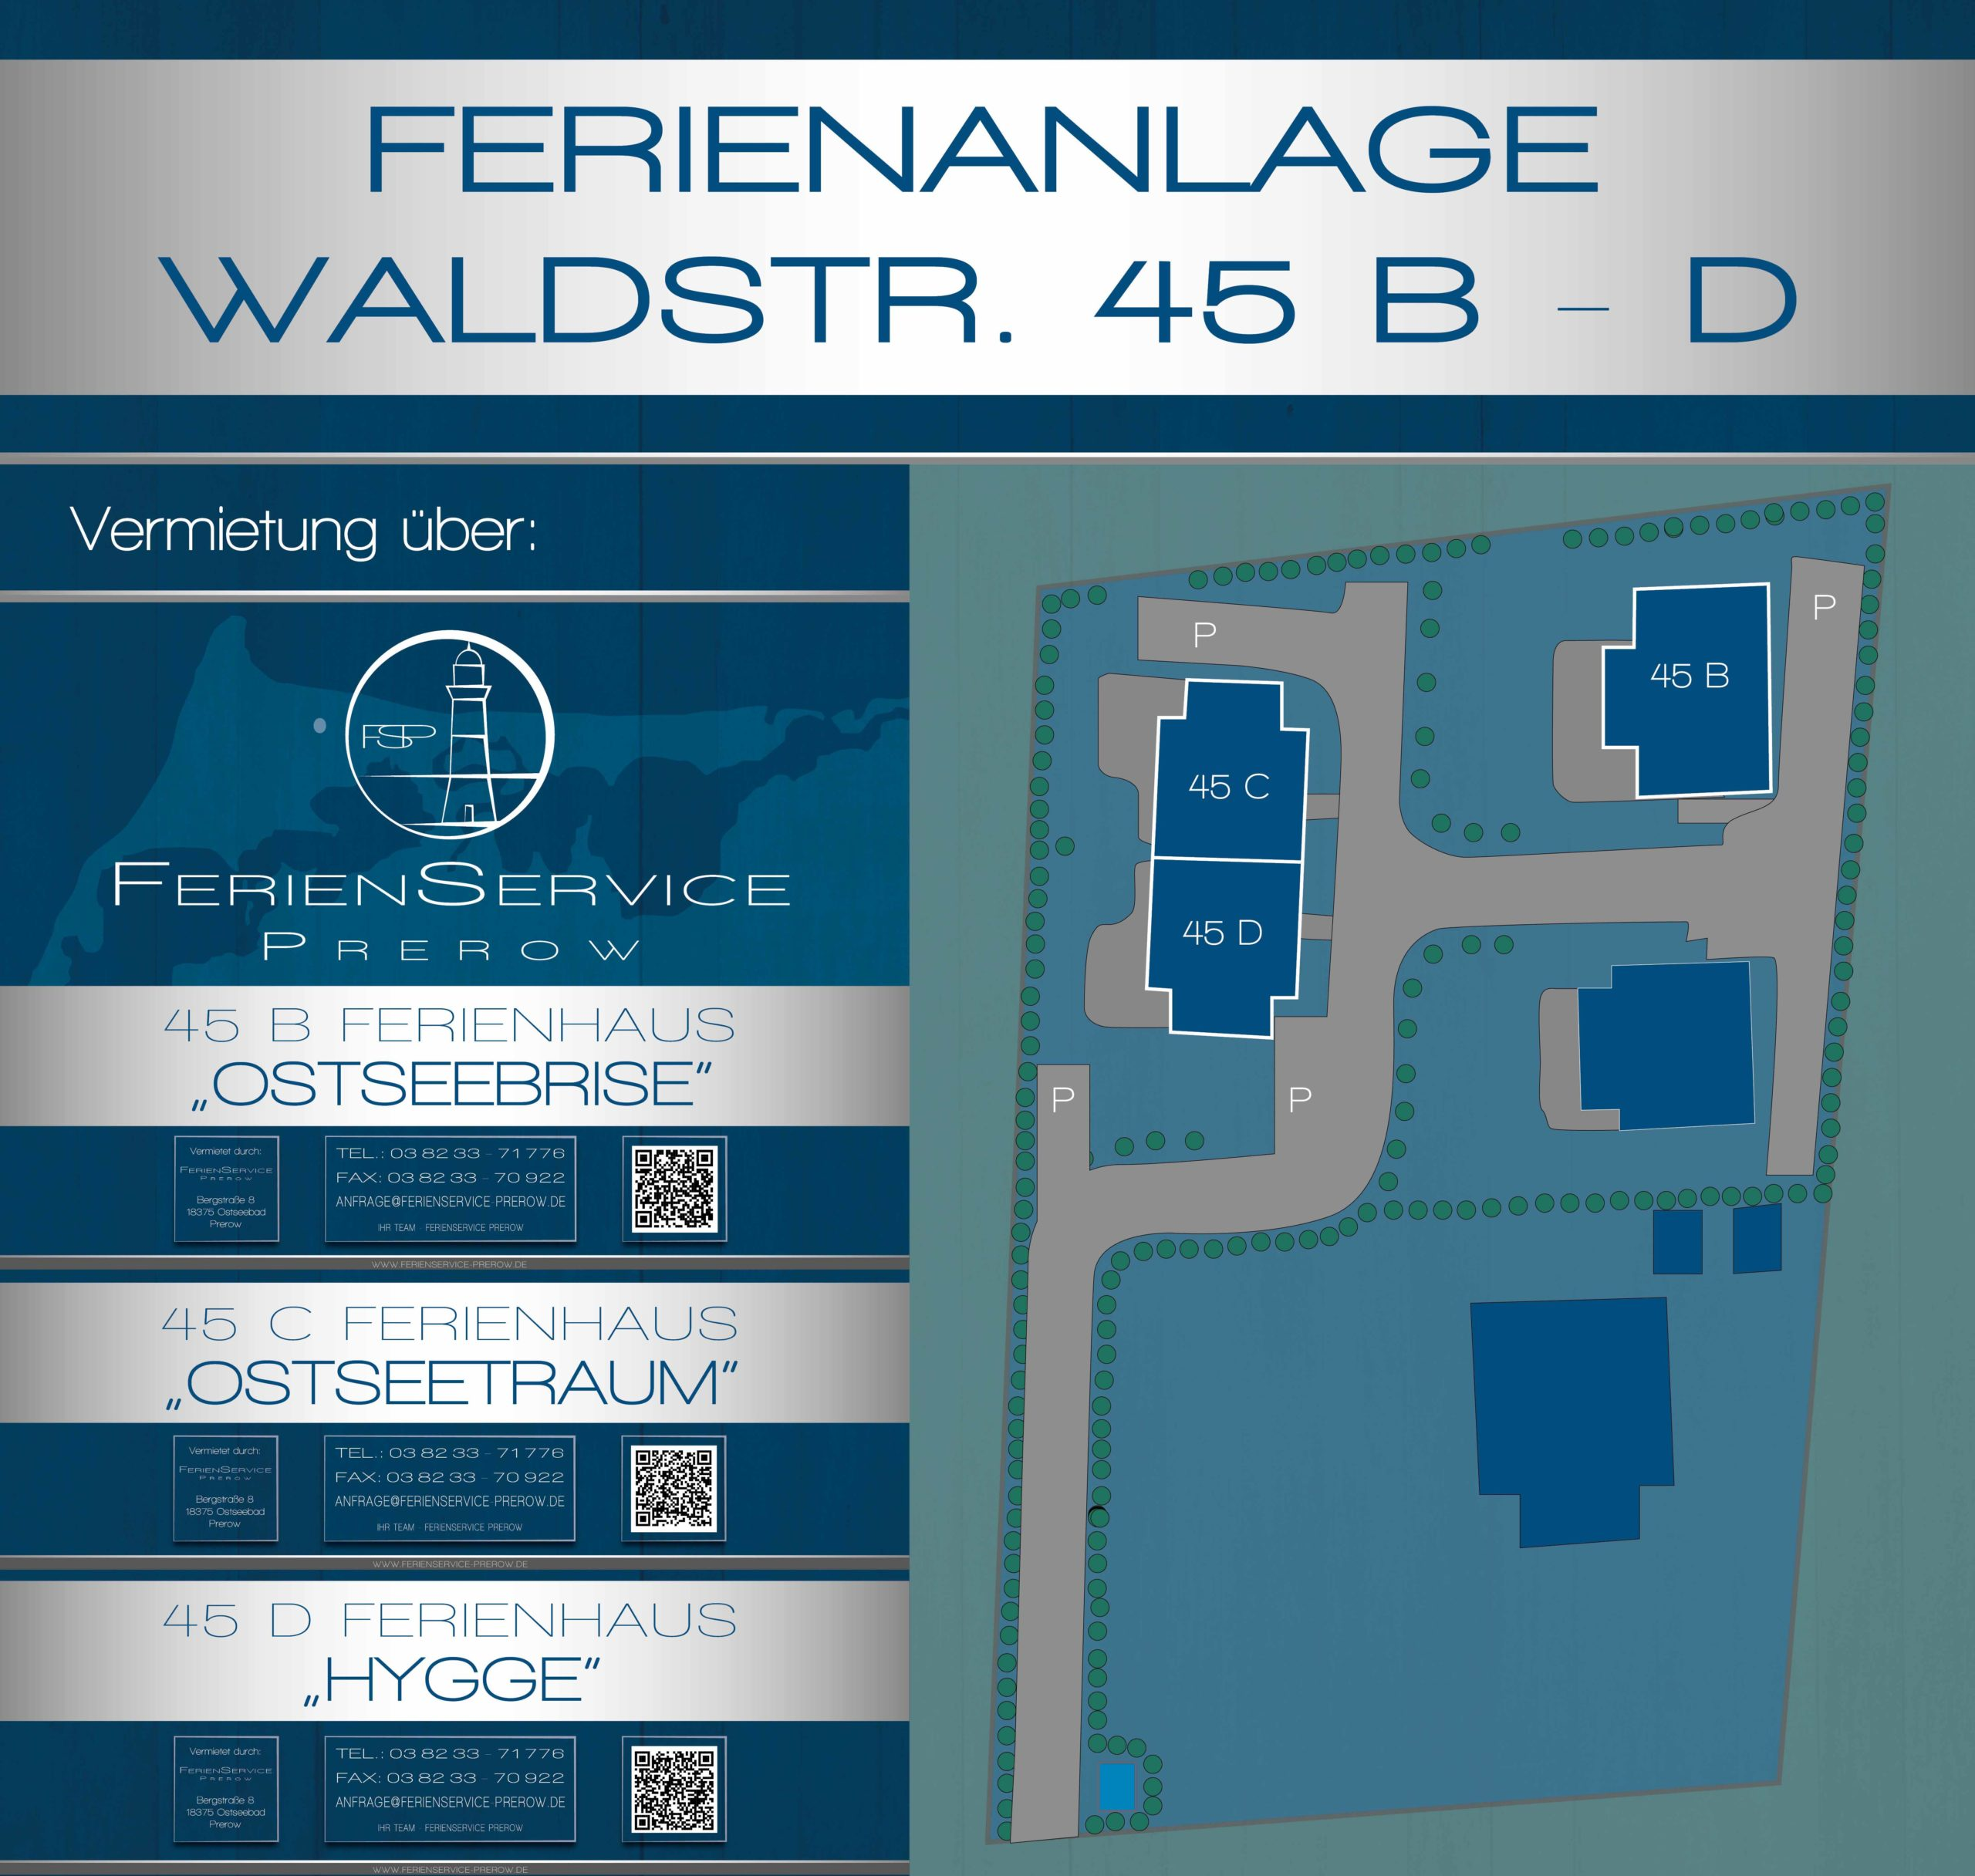 Prerow Ferienhaus OstseeTraum - Ferienservice Prerow, Waldstr. 45 C 18375 Ostseebad Prerow